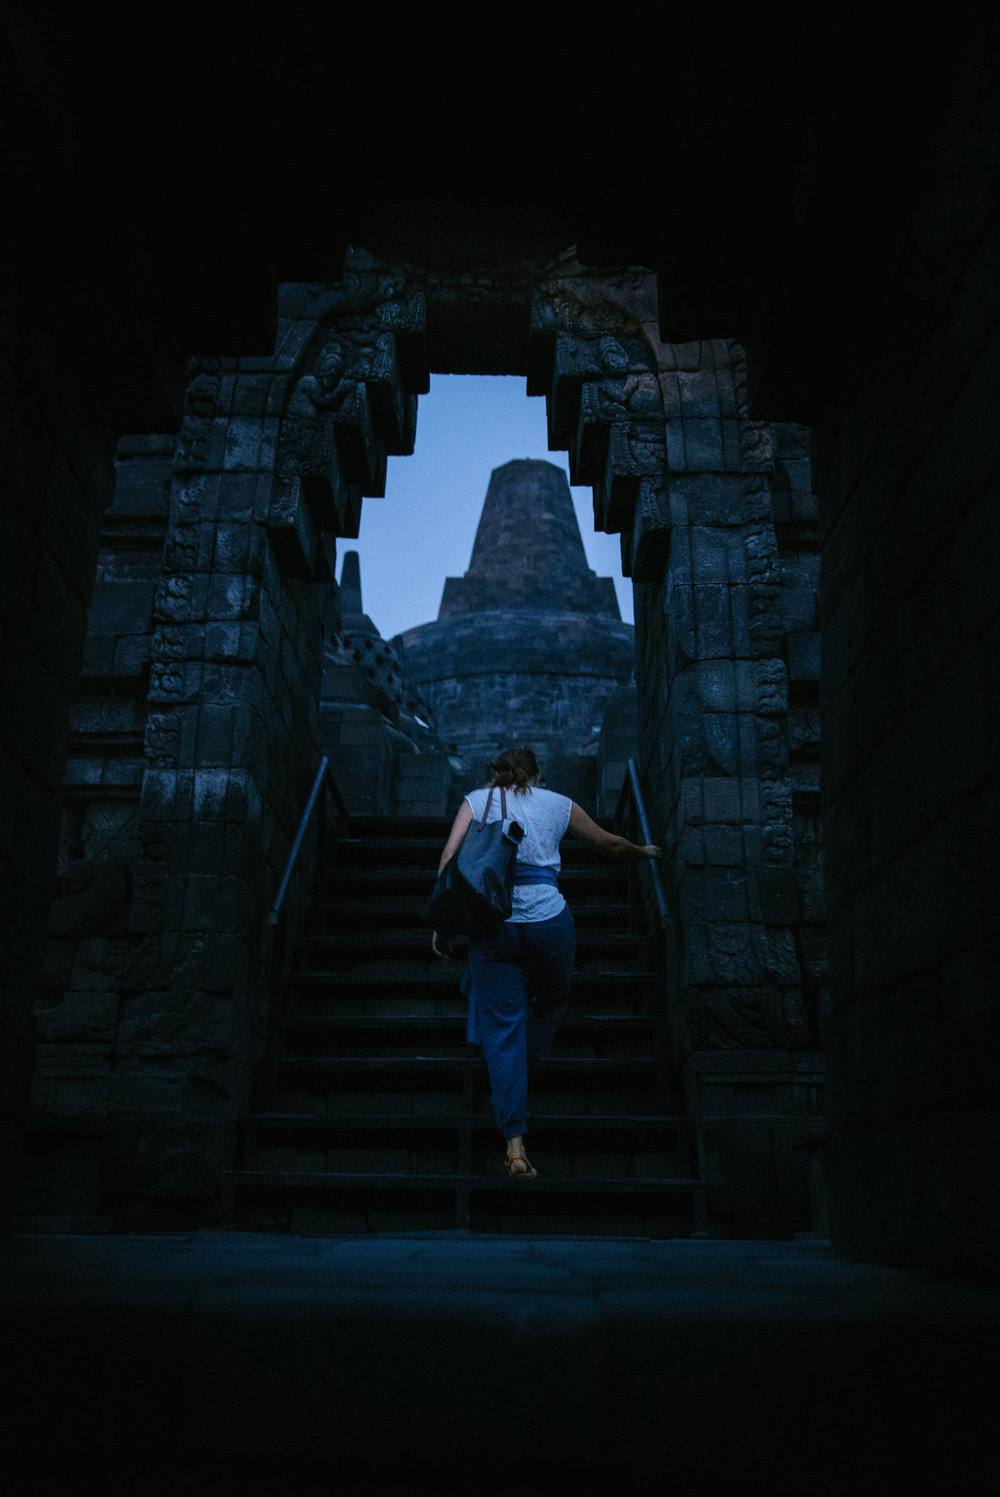 BOROBUDUR: ascending the steps.